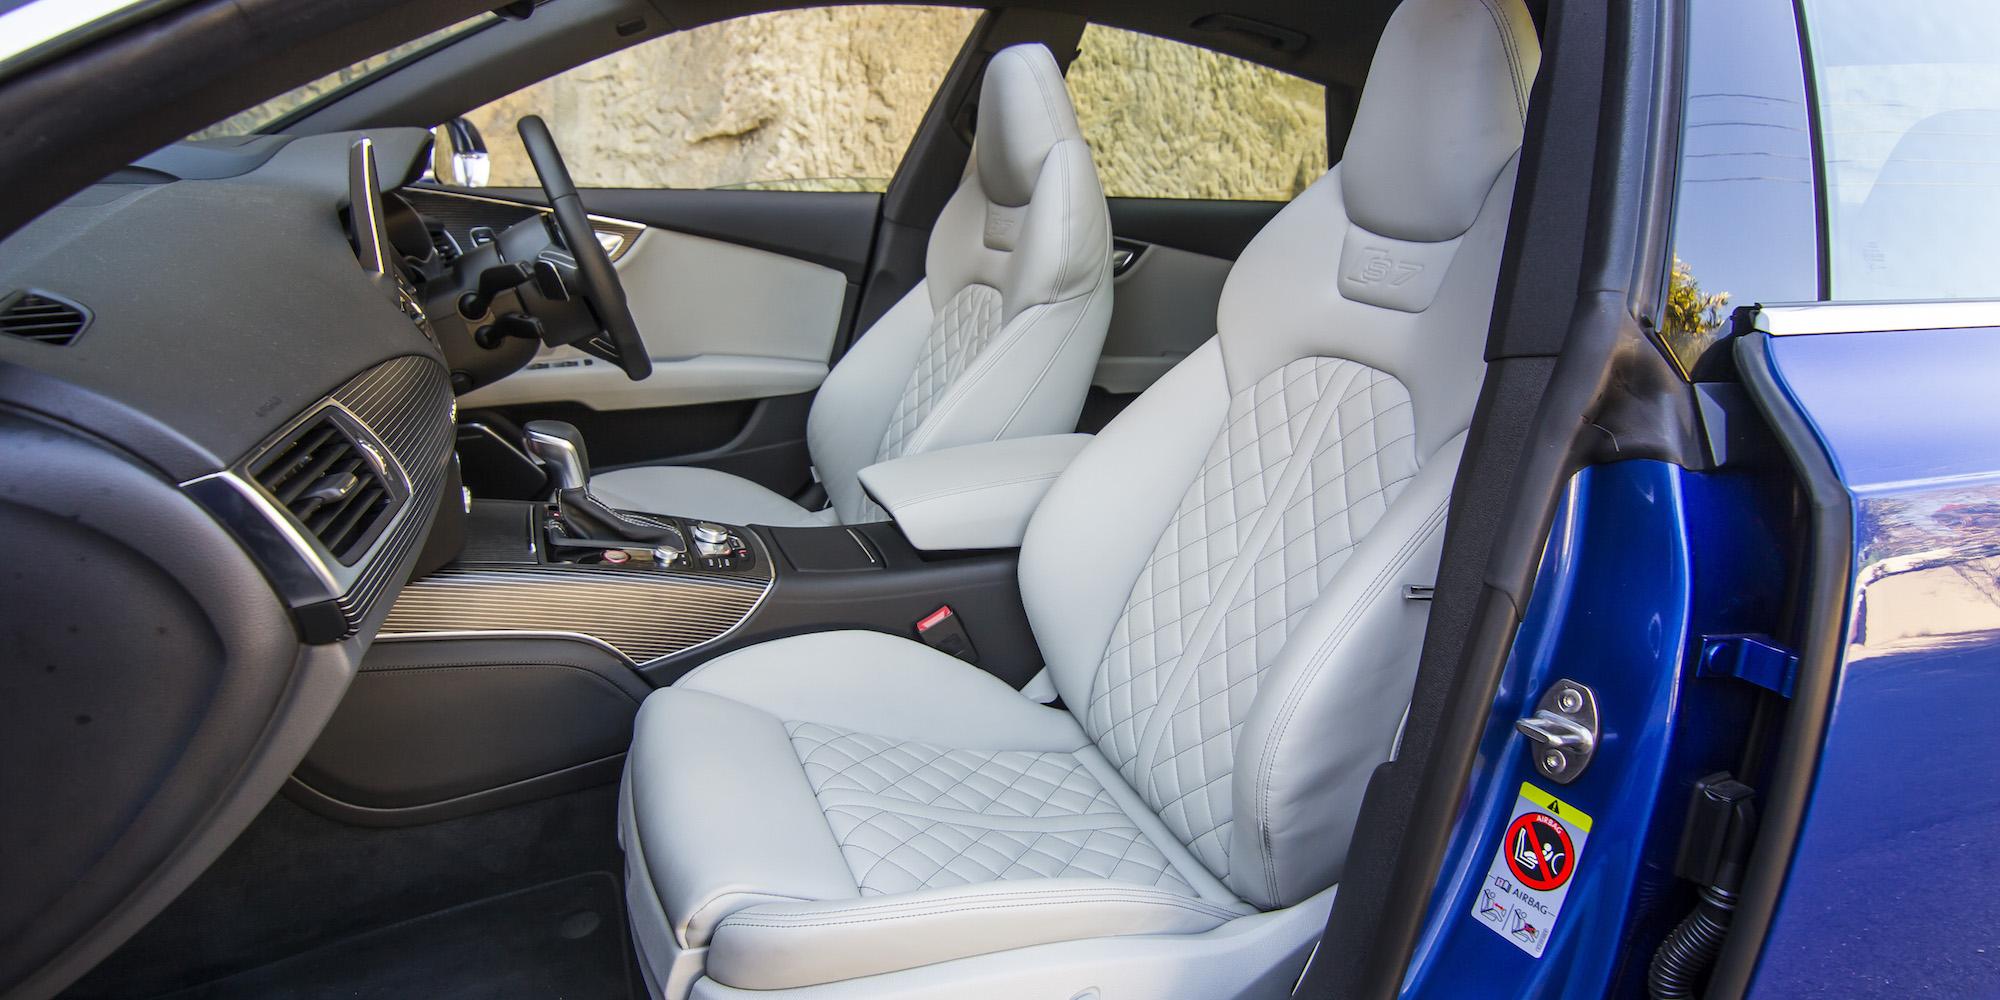 2016 Audi S7 Front Passenger Seat Interior